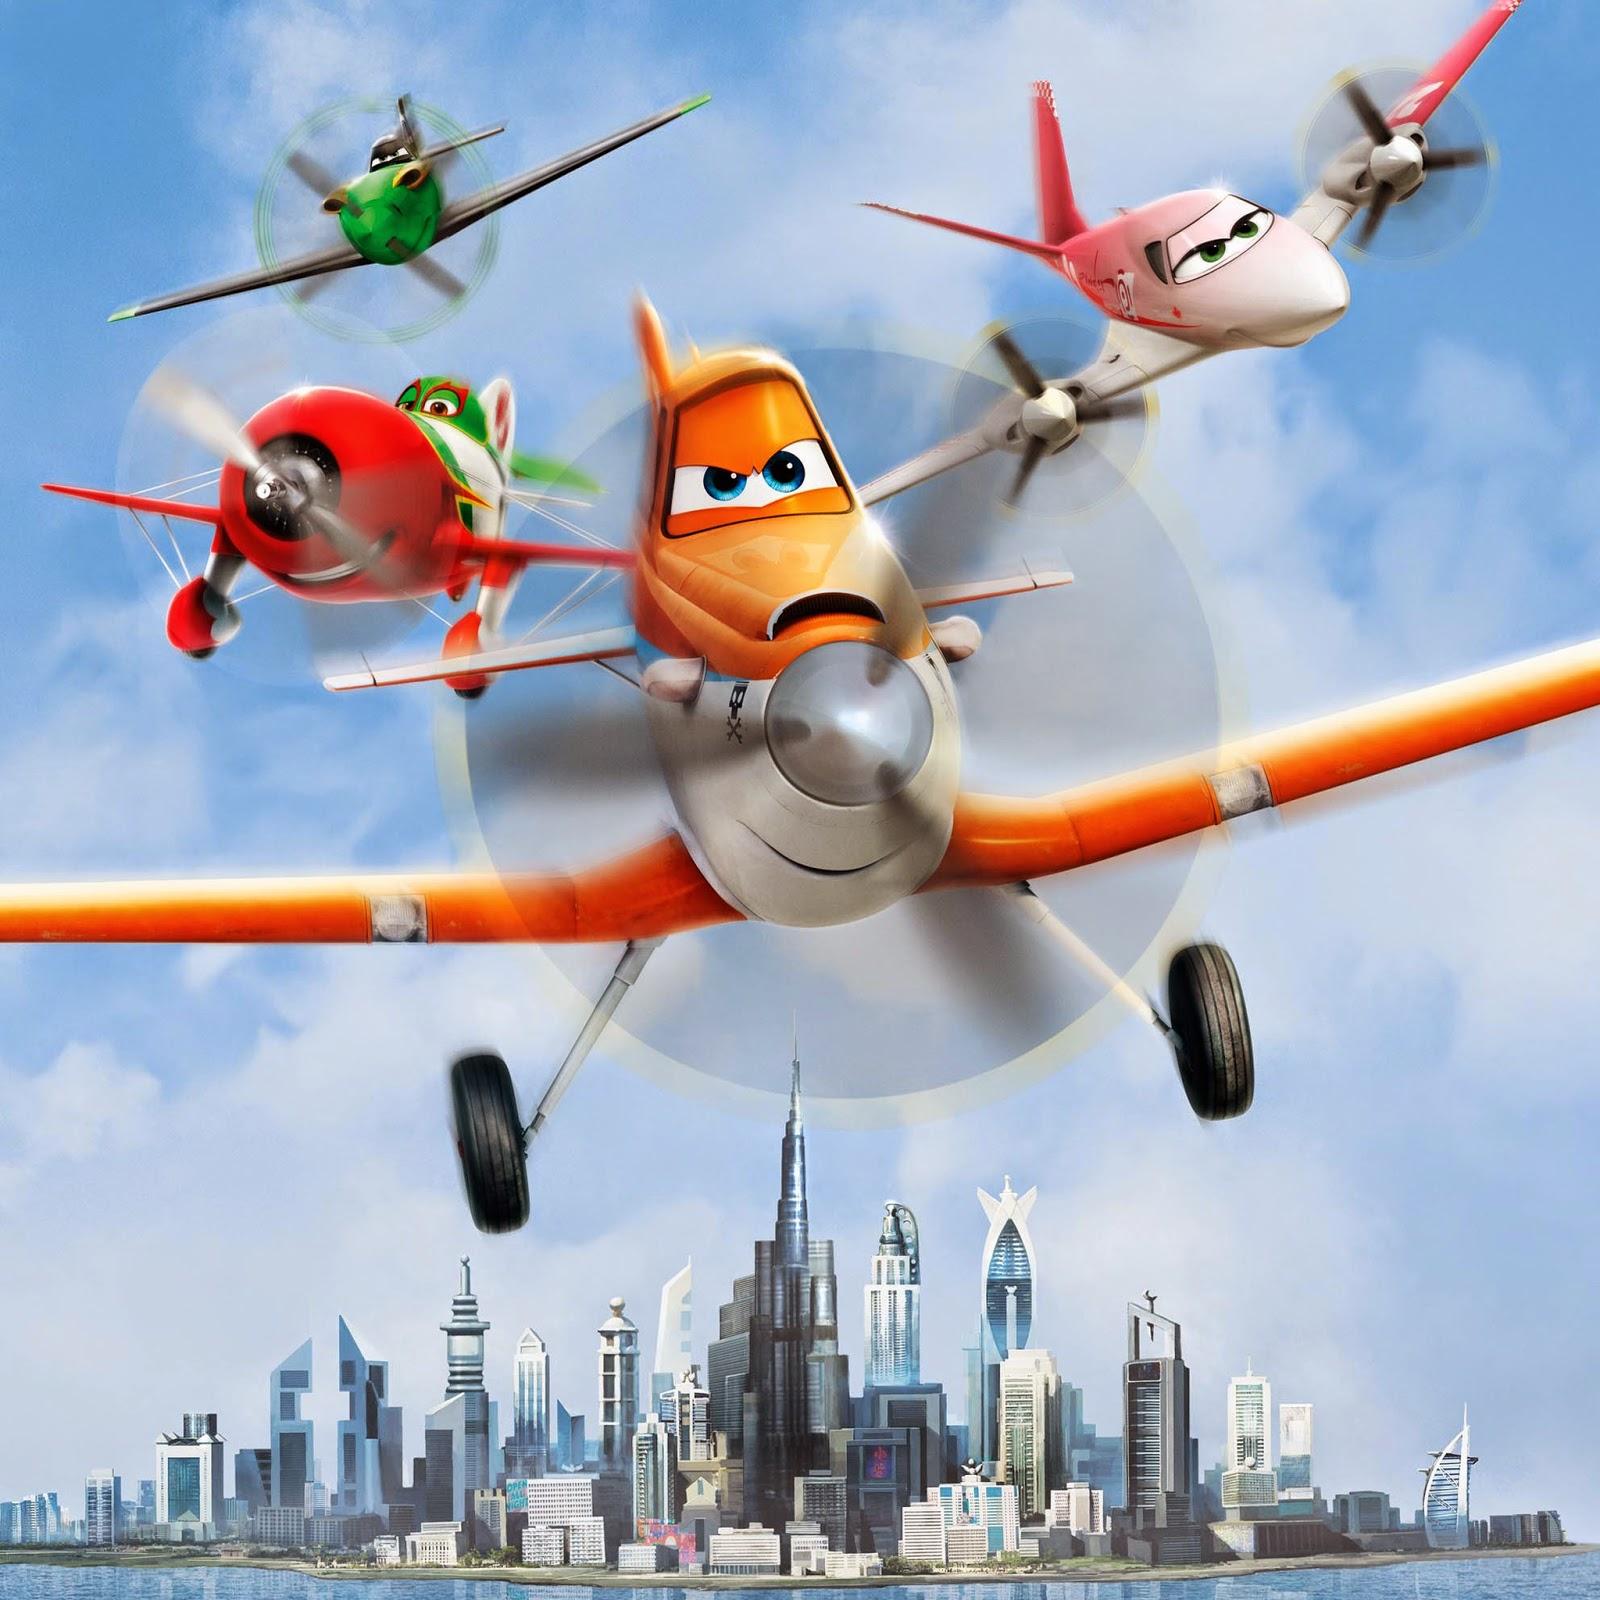 disney planes movie wallpapers - photo #15